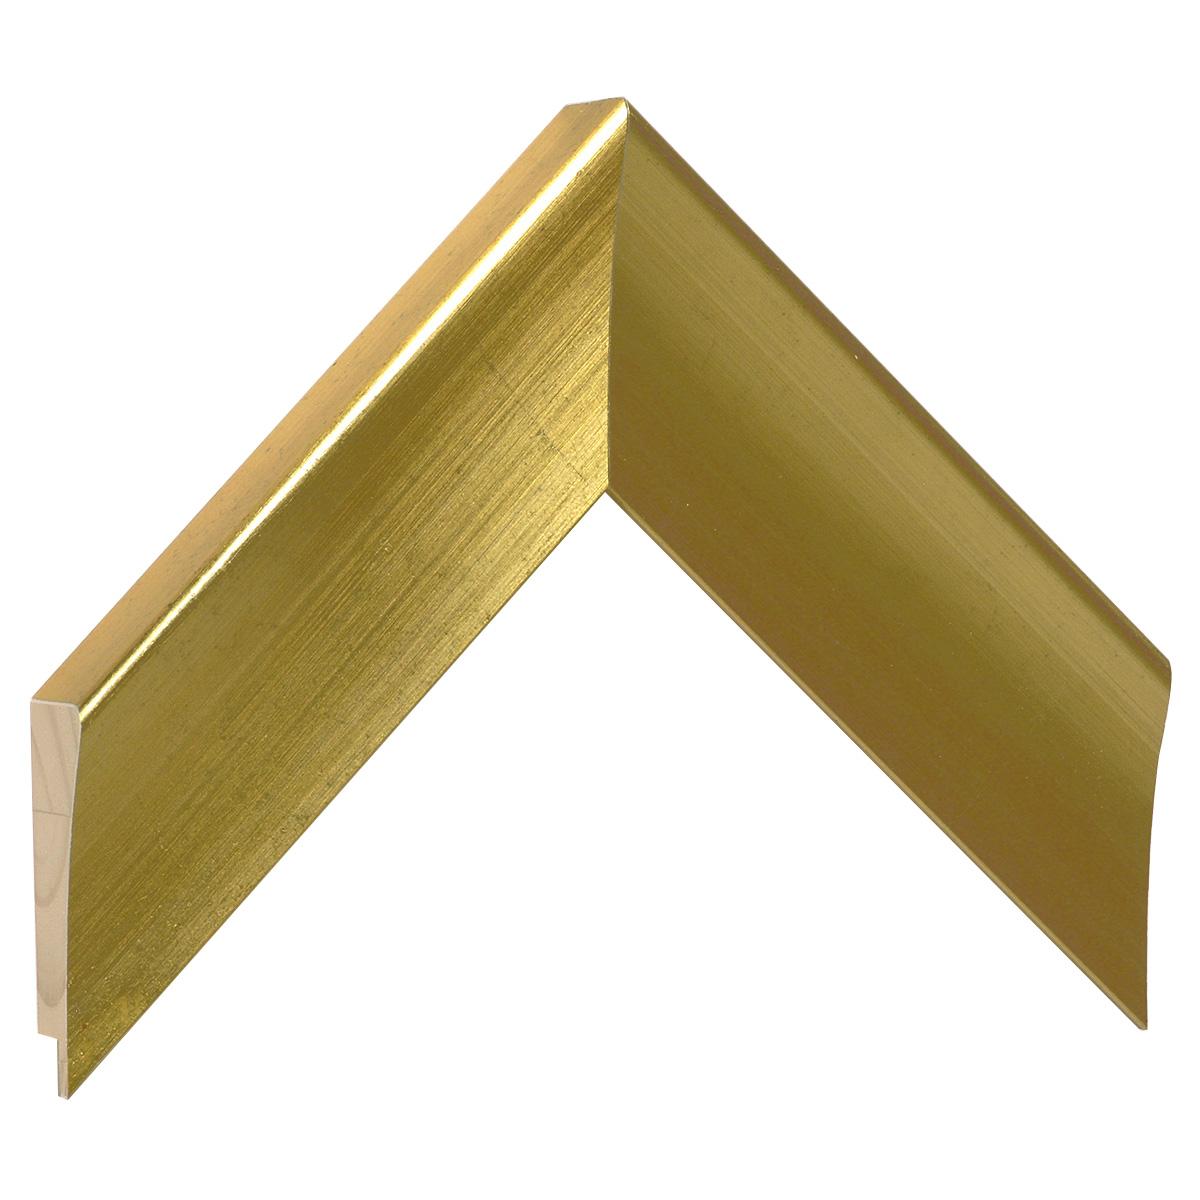 Moulding pine, 30mm - finish matt gold